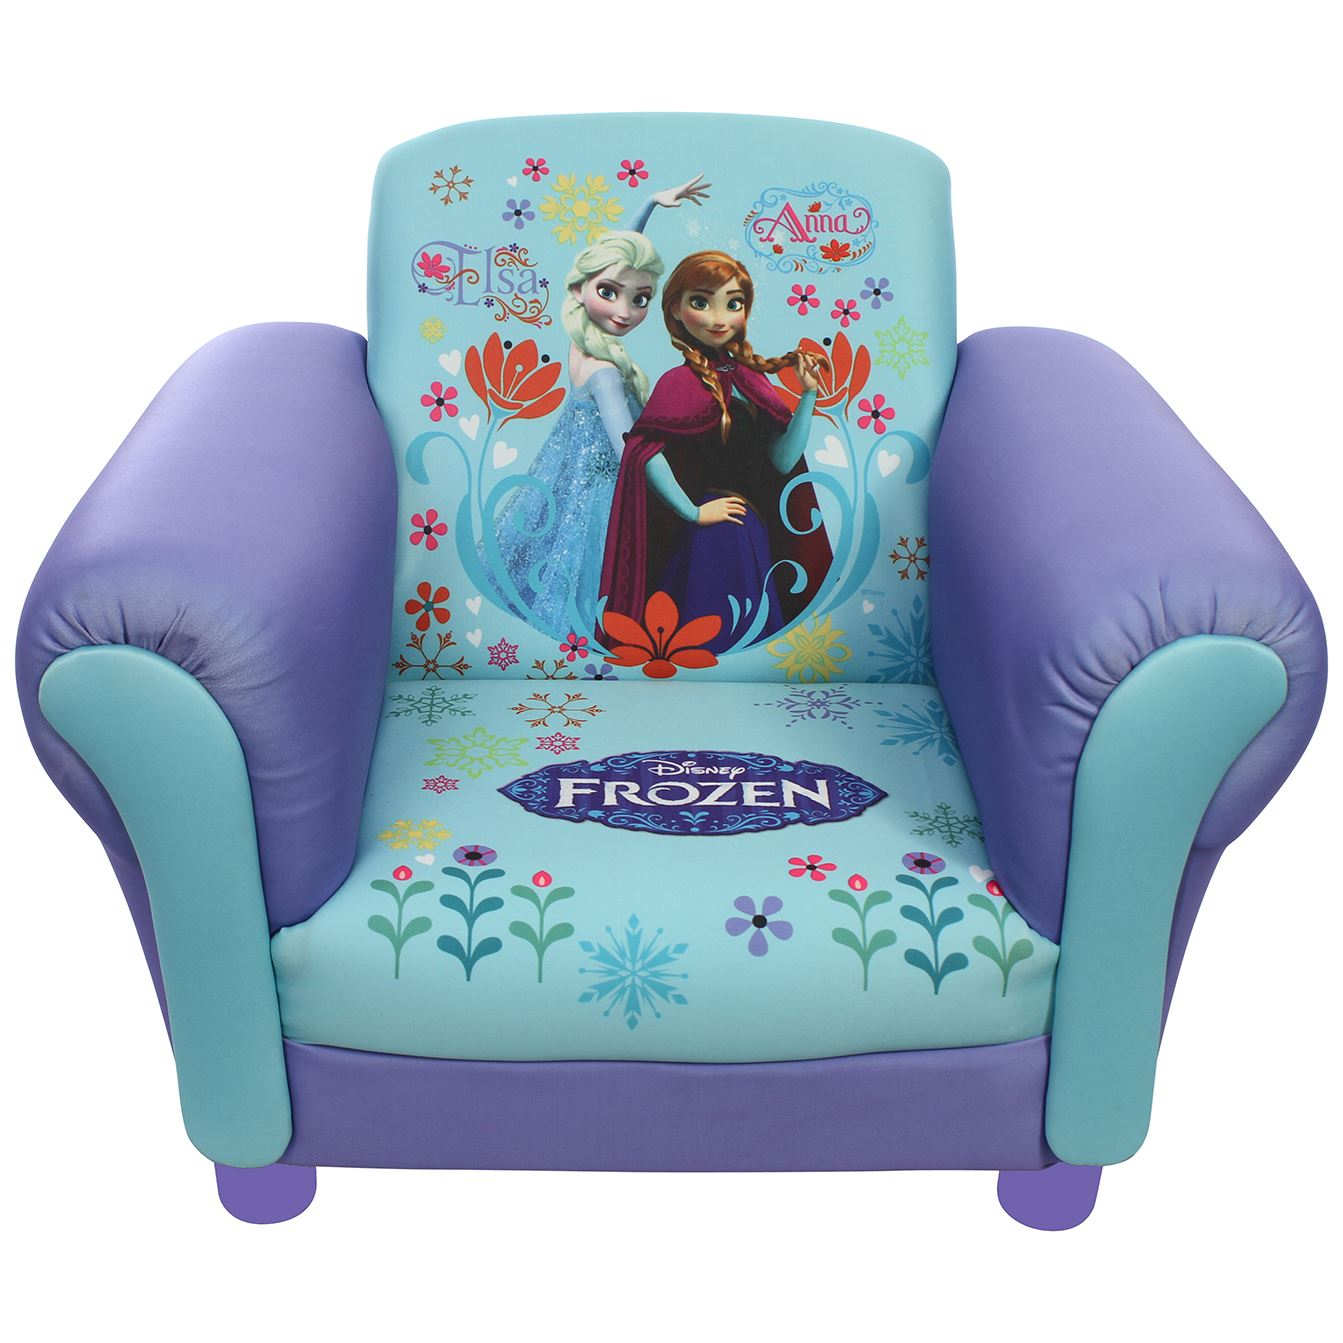 Cheap Bedroom Sets Kids Elsa From Frozen For Girls Toddler: Childrens Disney Kids Frozen Anna & Elsa Mickey Mouse